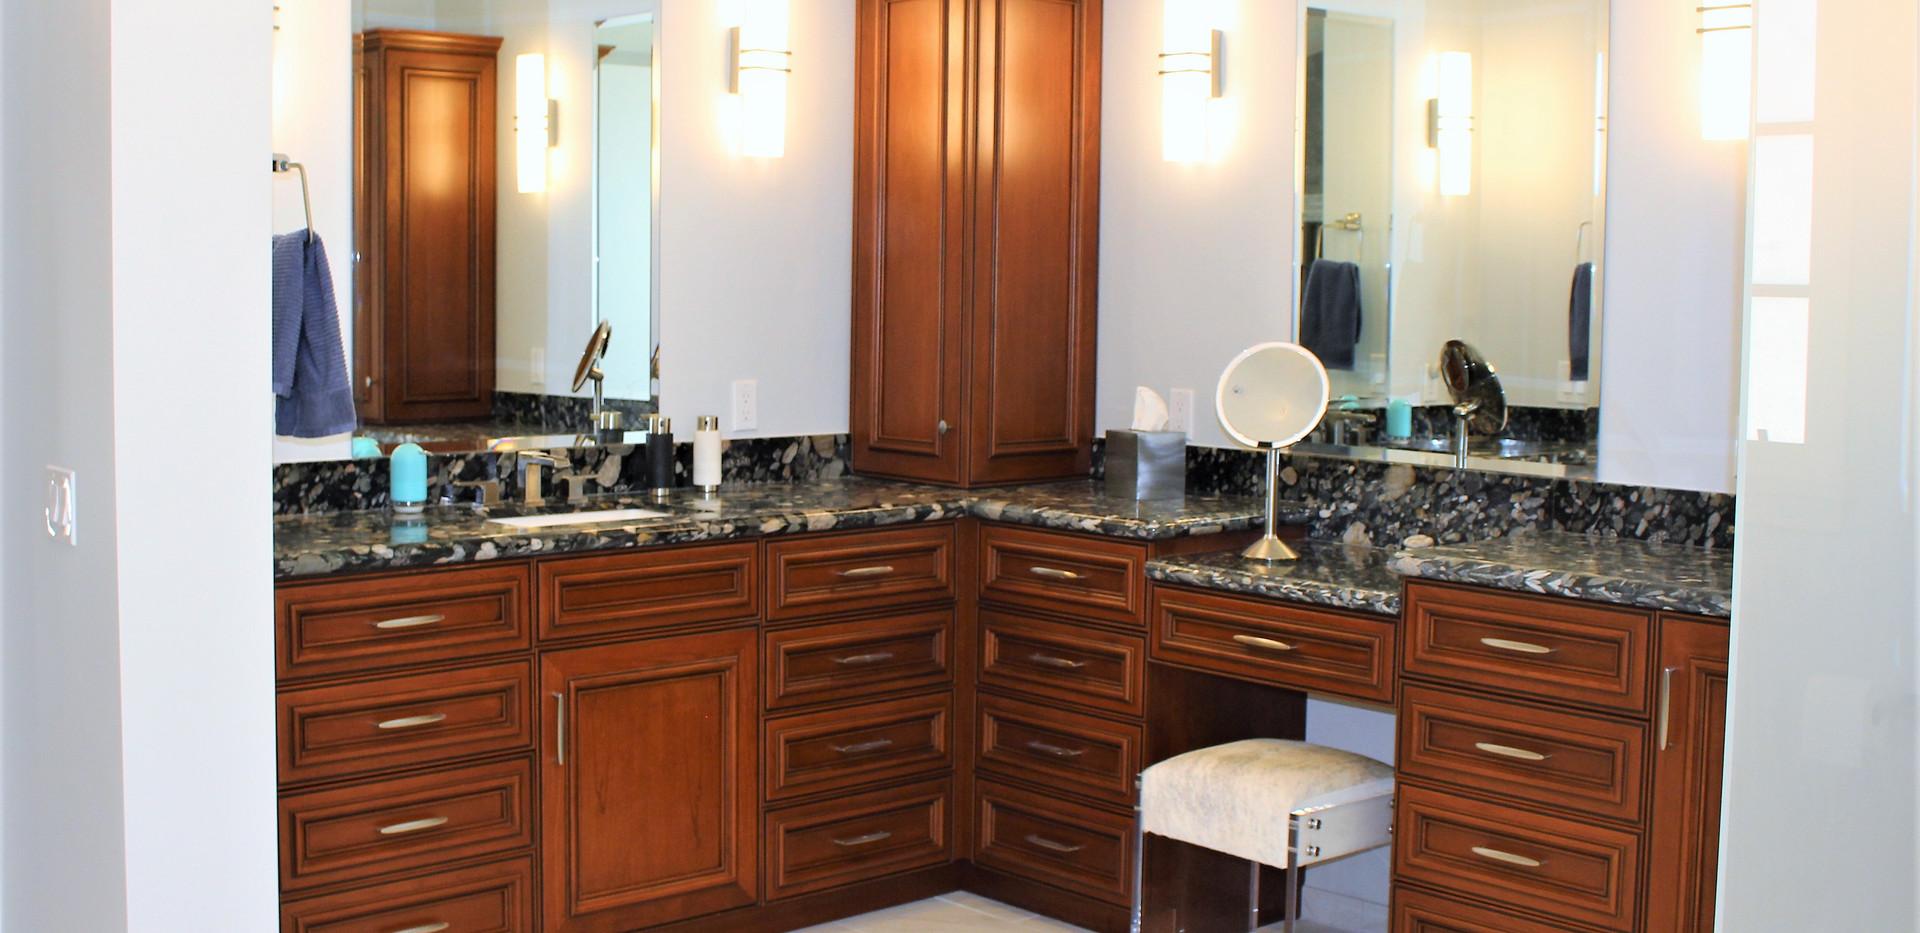 Built in Vanity Master Bath - Cimmaron.j